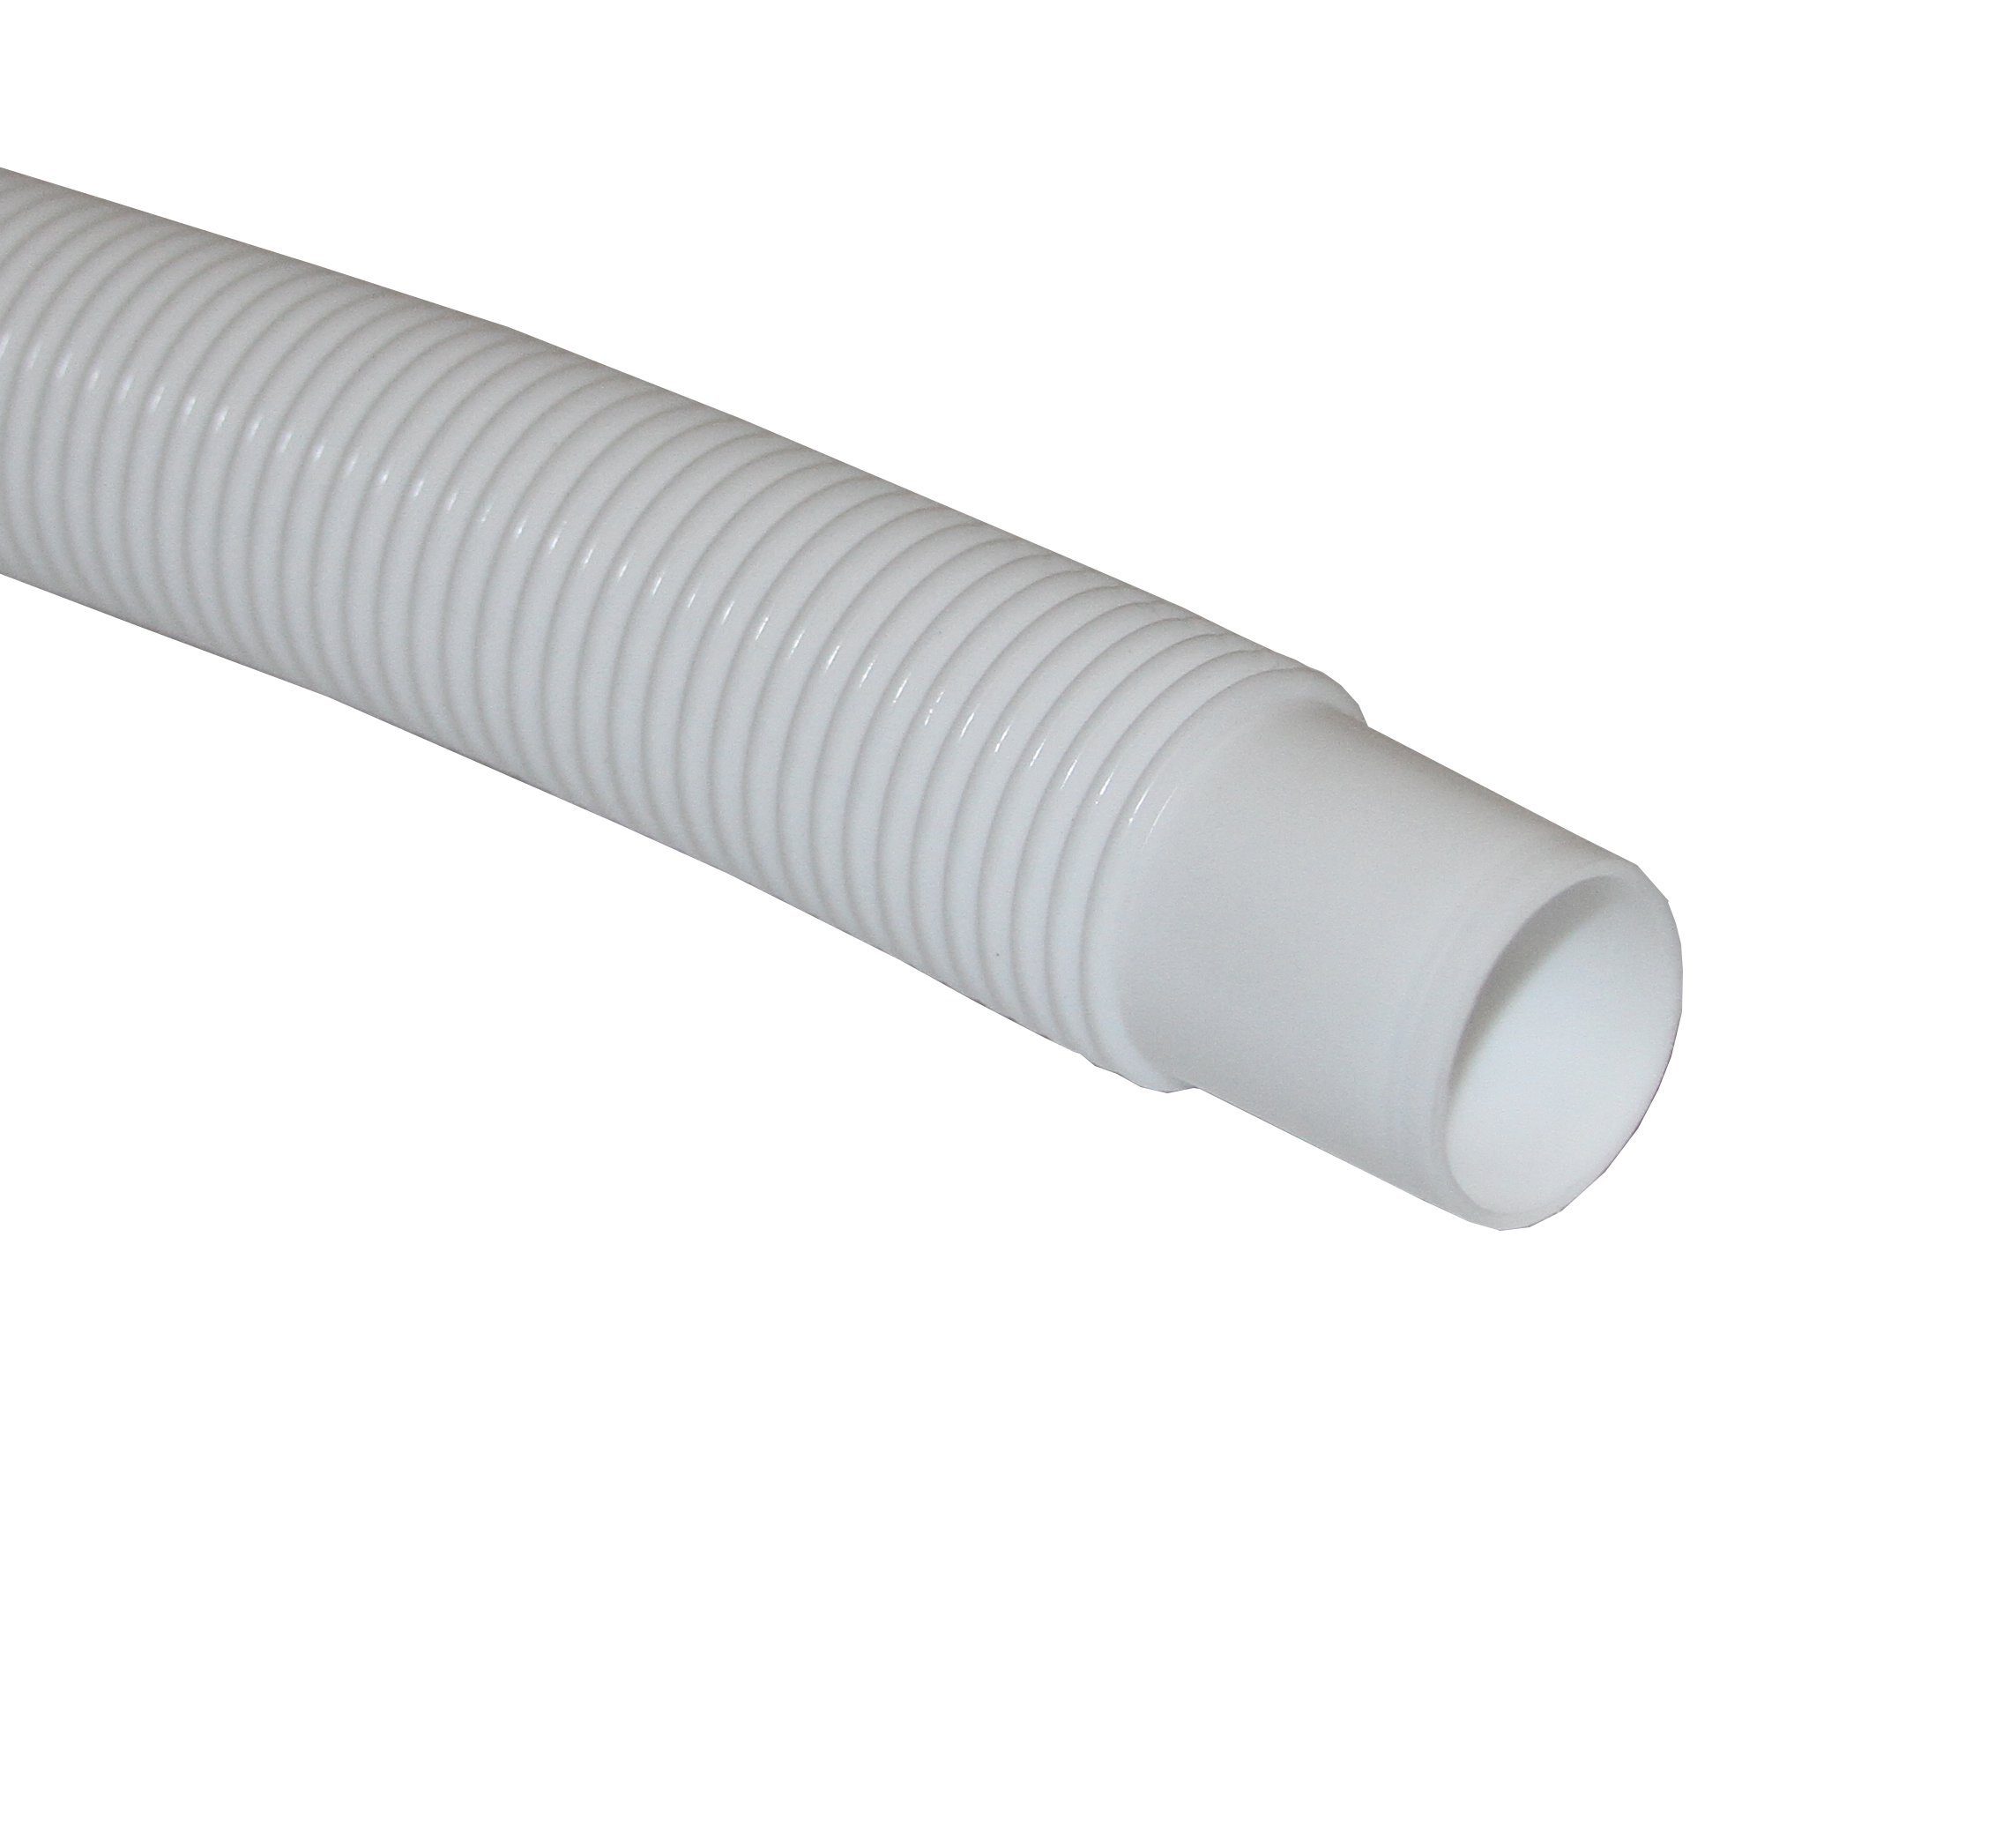 UDP T34004003 Bilge Hose Tubing, 1-1/4'' ID x 1-3/4'' OD x 25' Dispenser Box, White